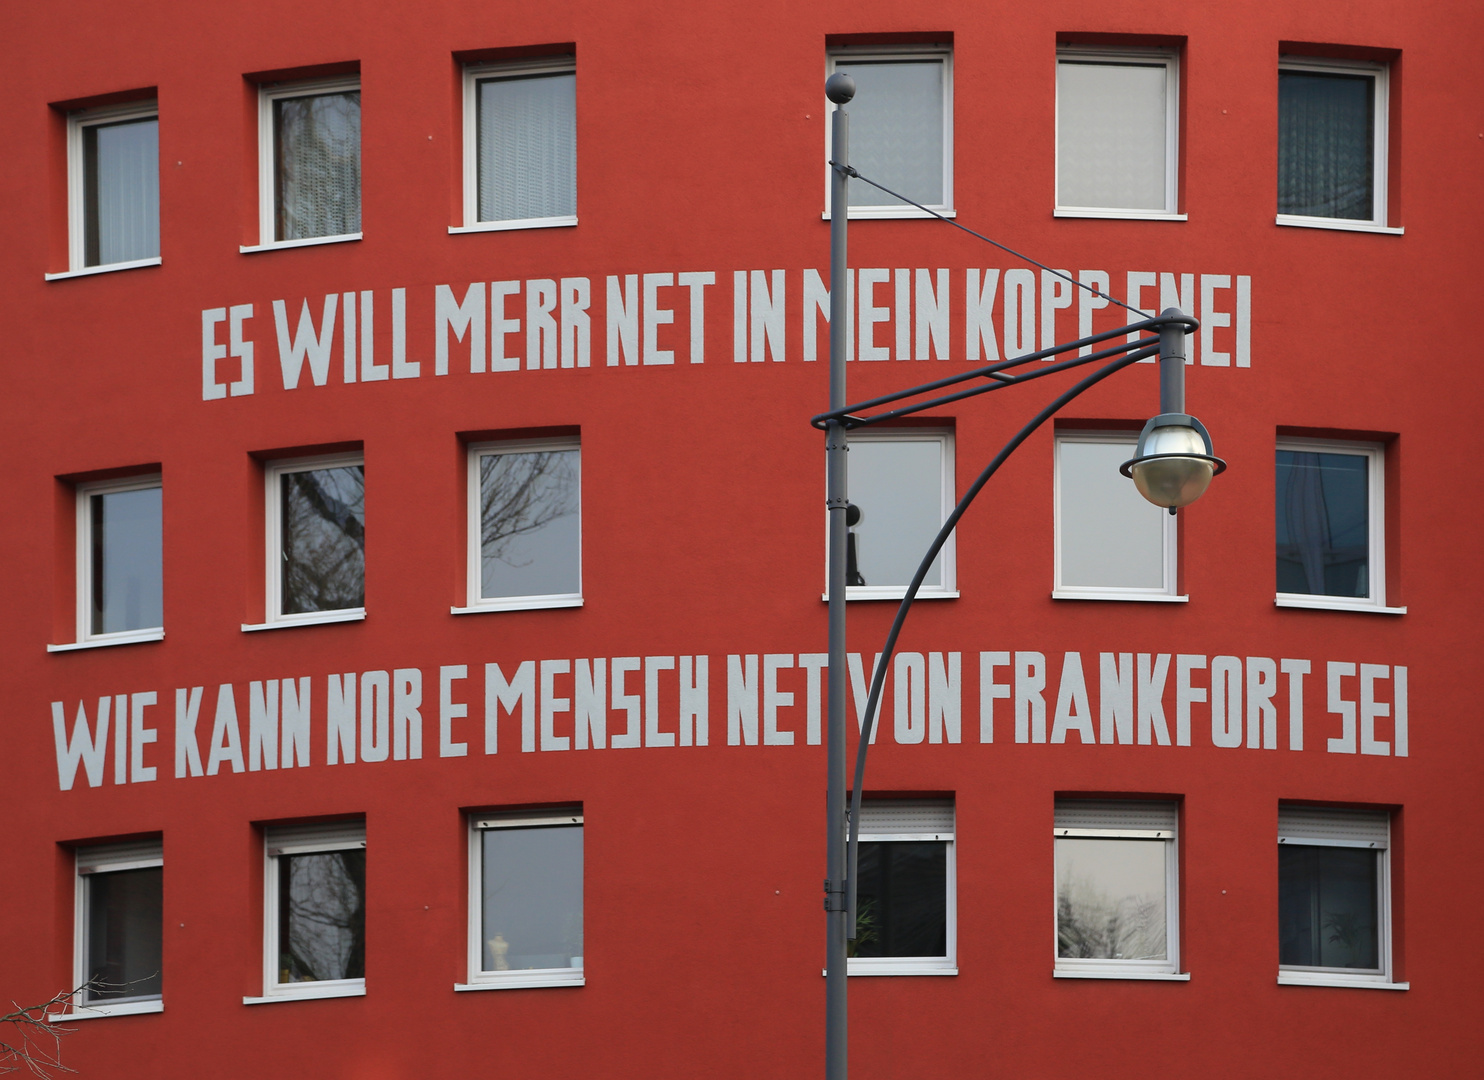 Frankfurt - Lokalpatriotismus